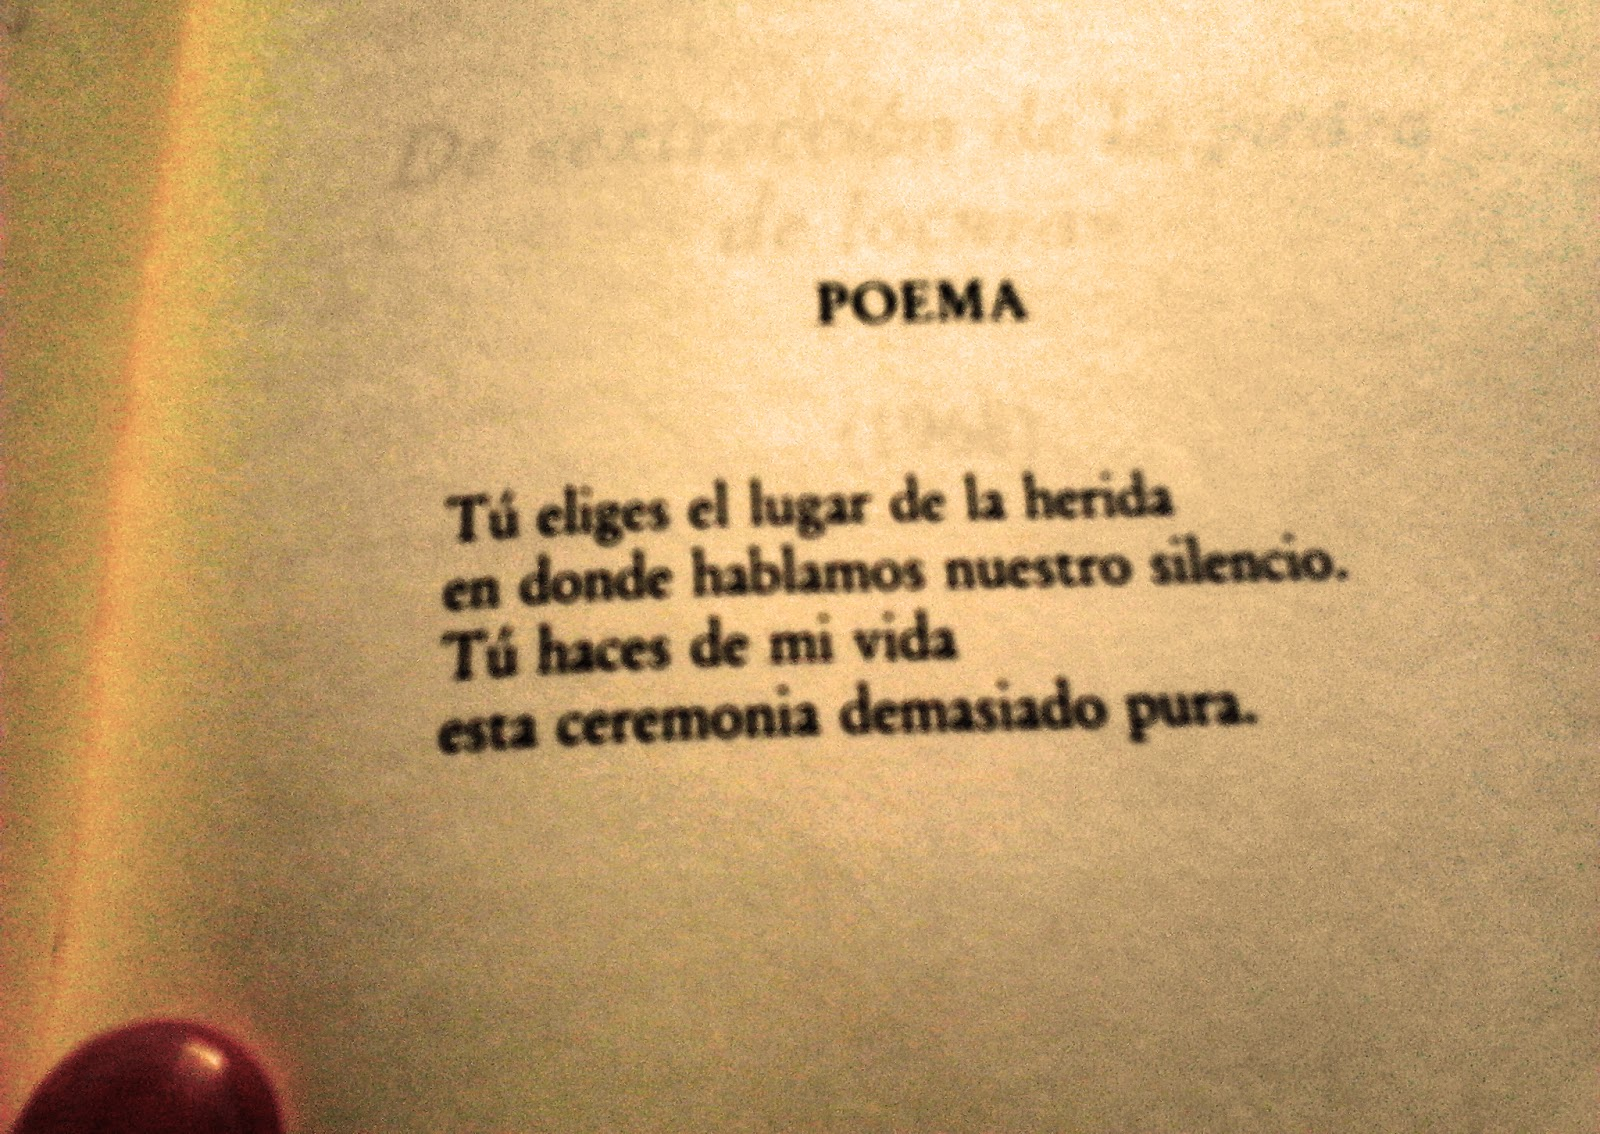 Alejandra Pizarnik Textos Y Poemas | apexwallpapers.com